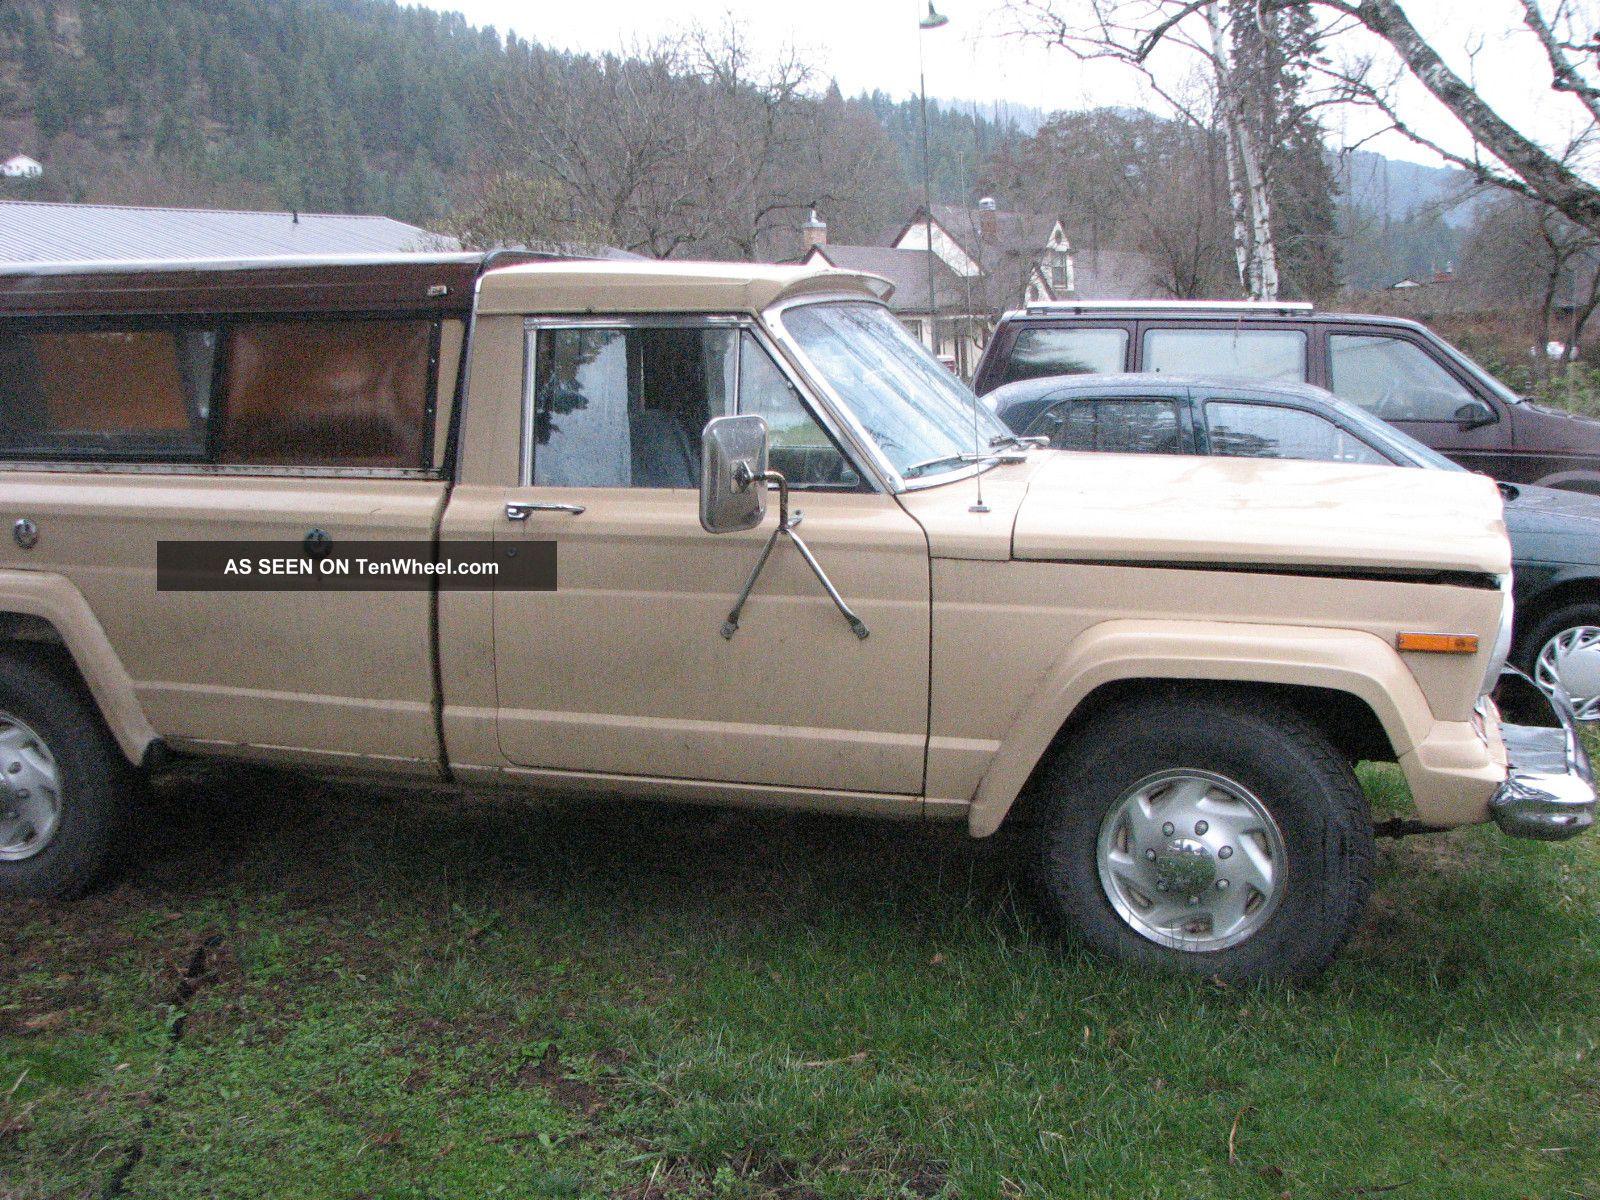 1976 Jeep J20 Gladiator Truck 3 / 4 Ton Cab Pickup 2 - Door